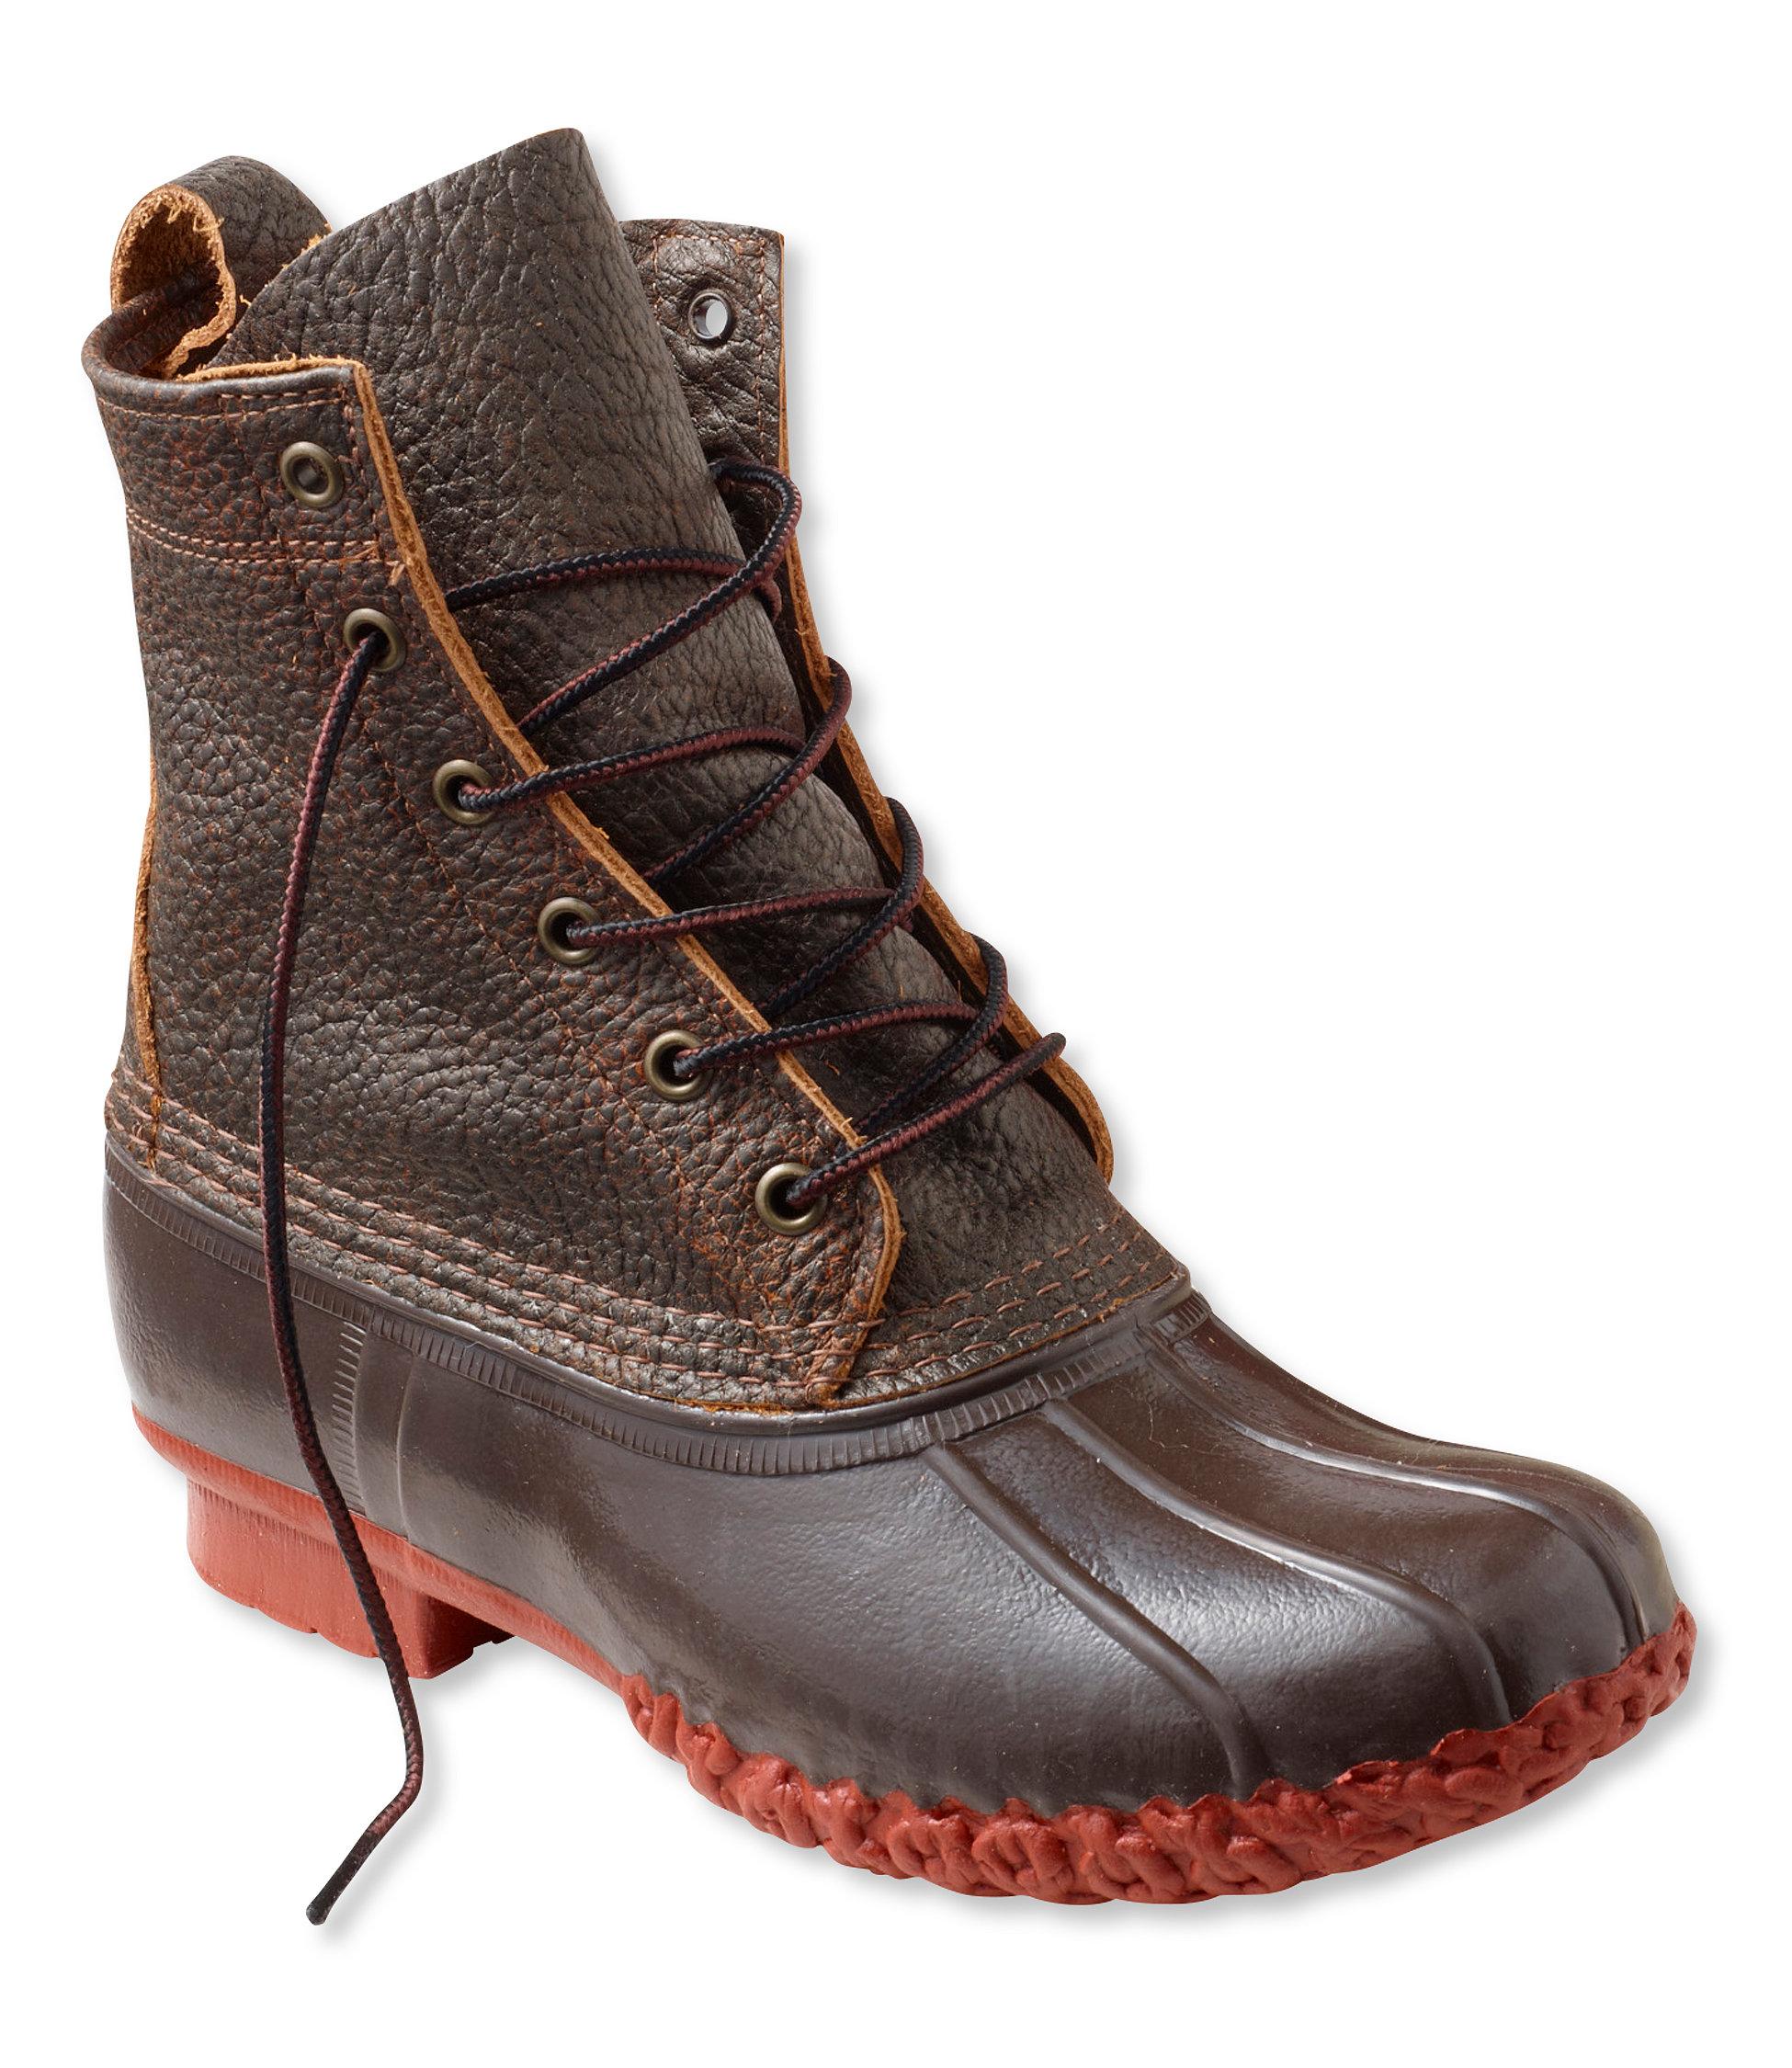 Winter Boot Reviews - Trailspace.com